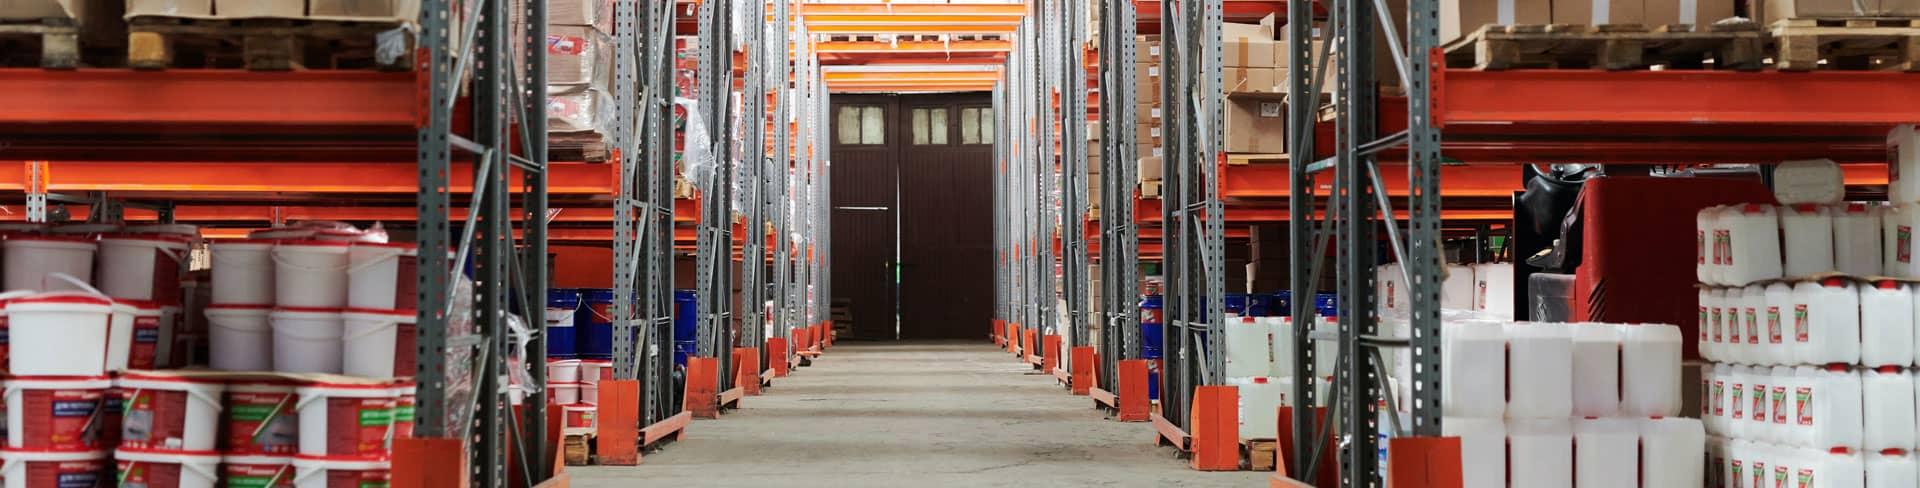 Managing Warehouse